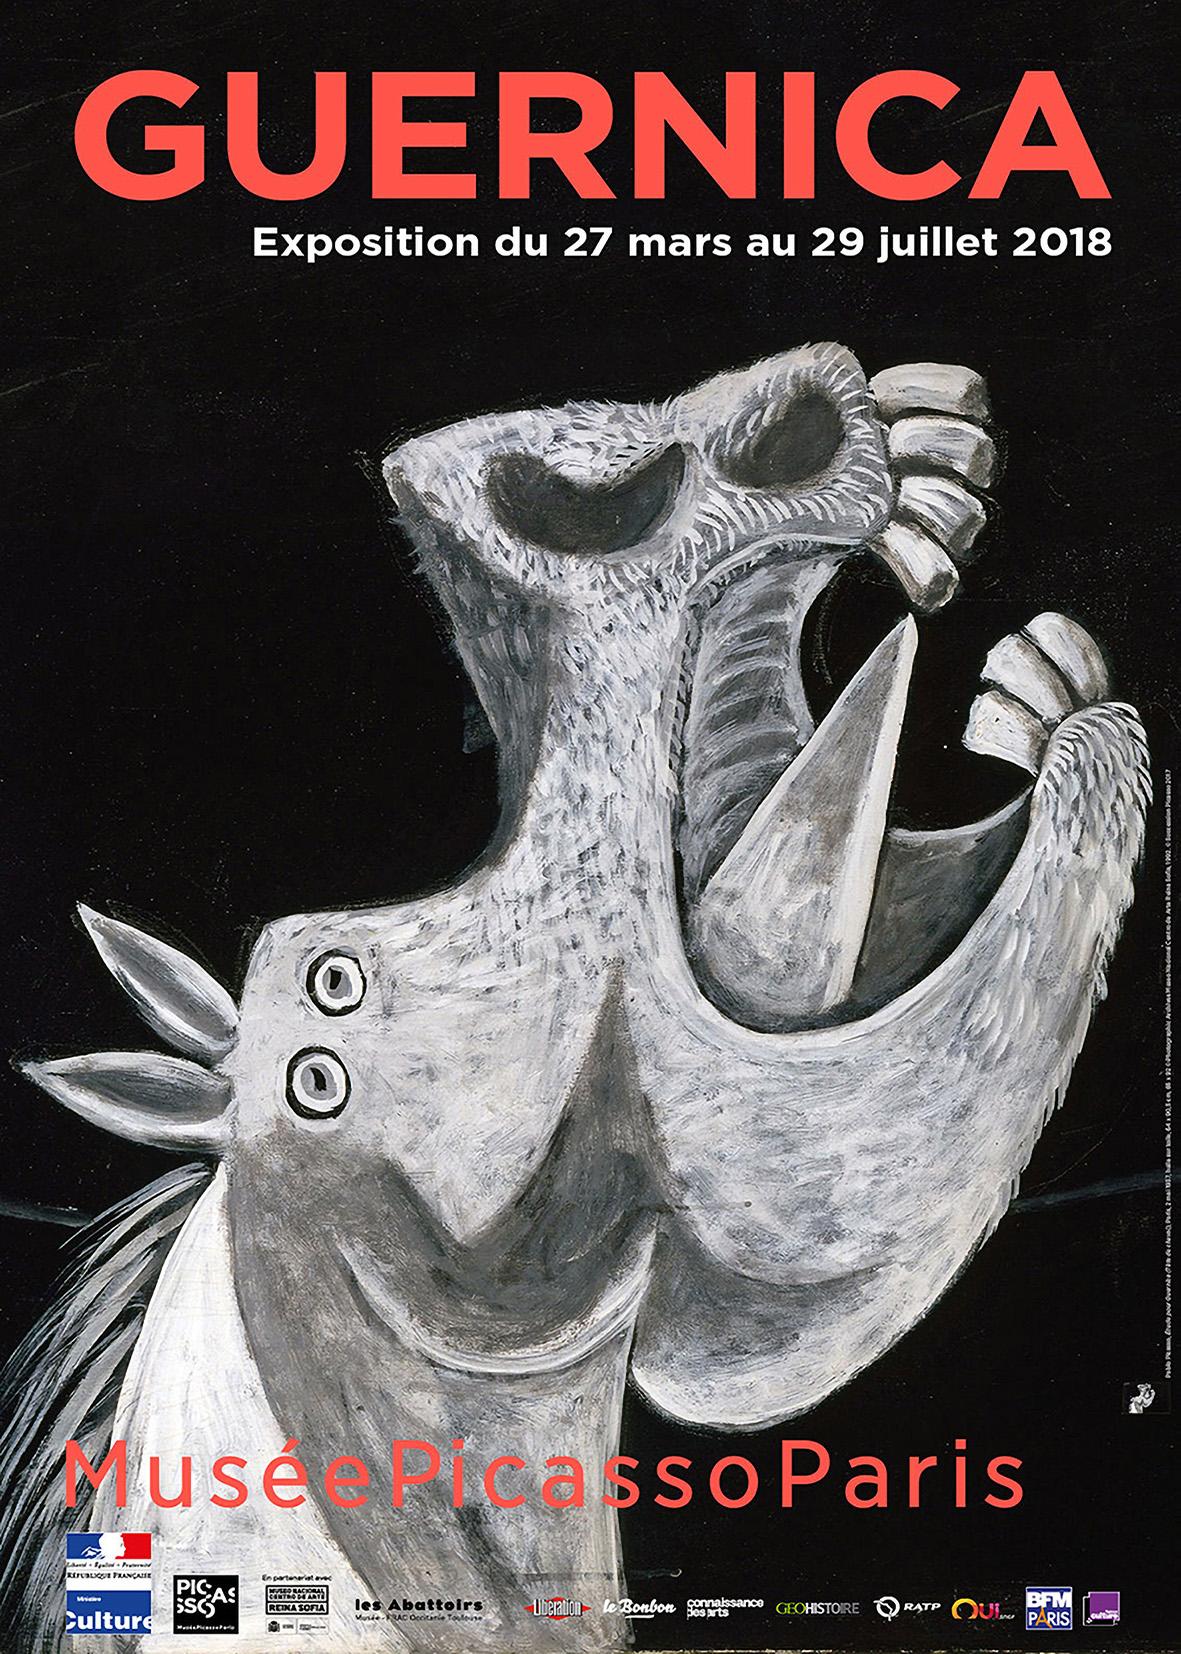 © Musée National Picasso Paris